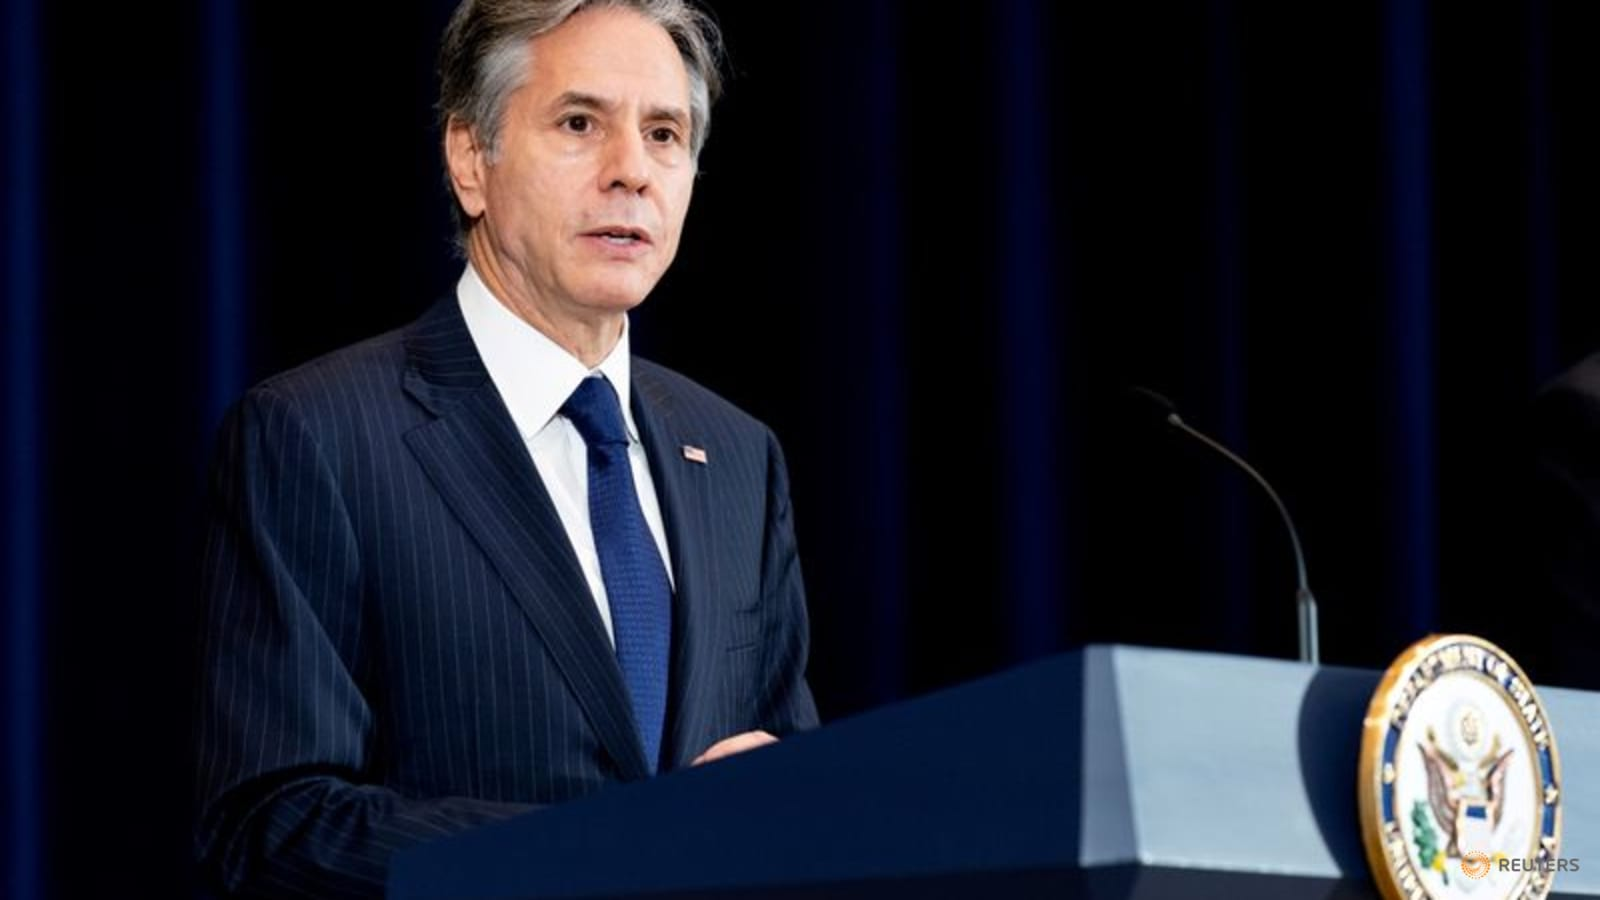 No plans for US, Iran to meet at UN next week, says US envoy